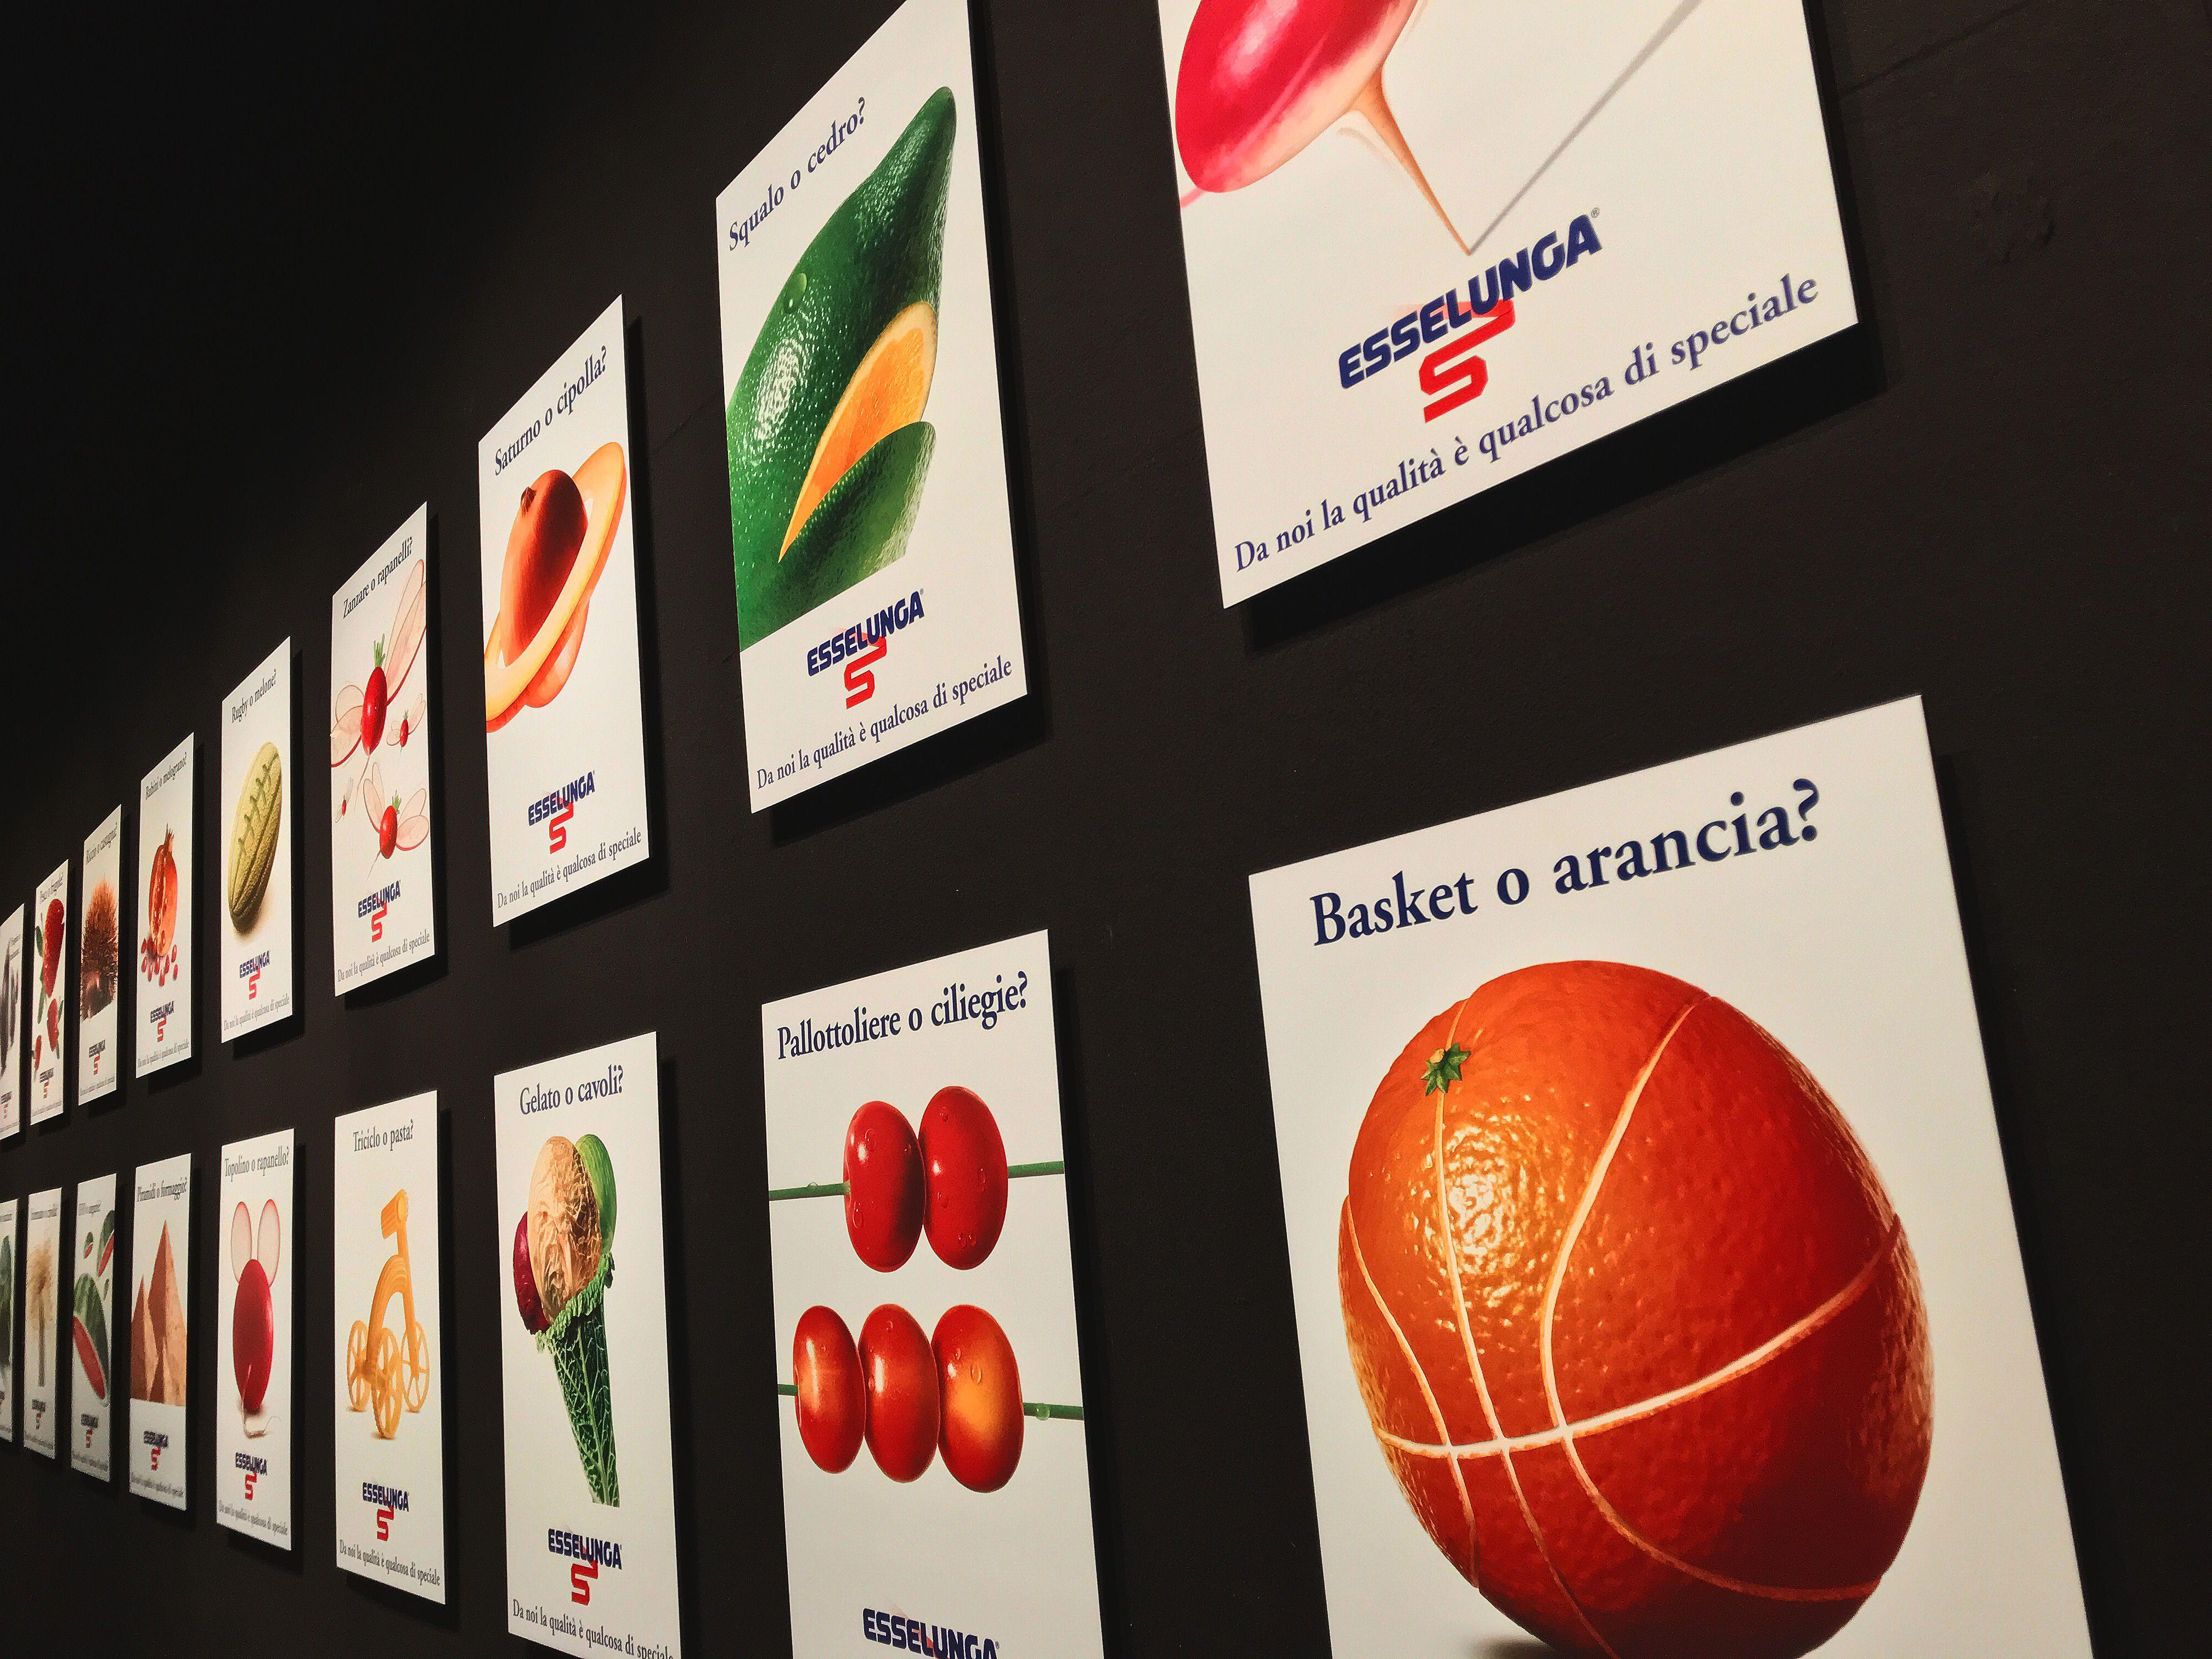 esselunga 🍋 #exhibition @esselunga #60 #year #location